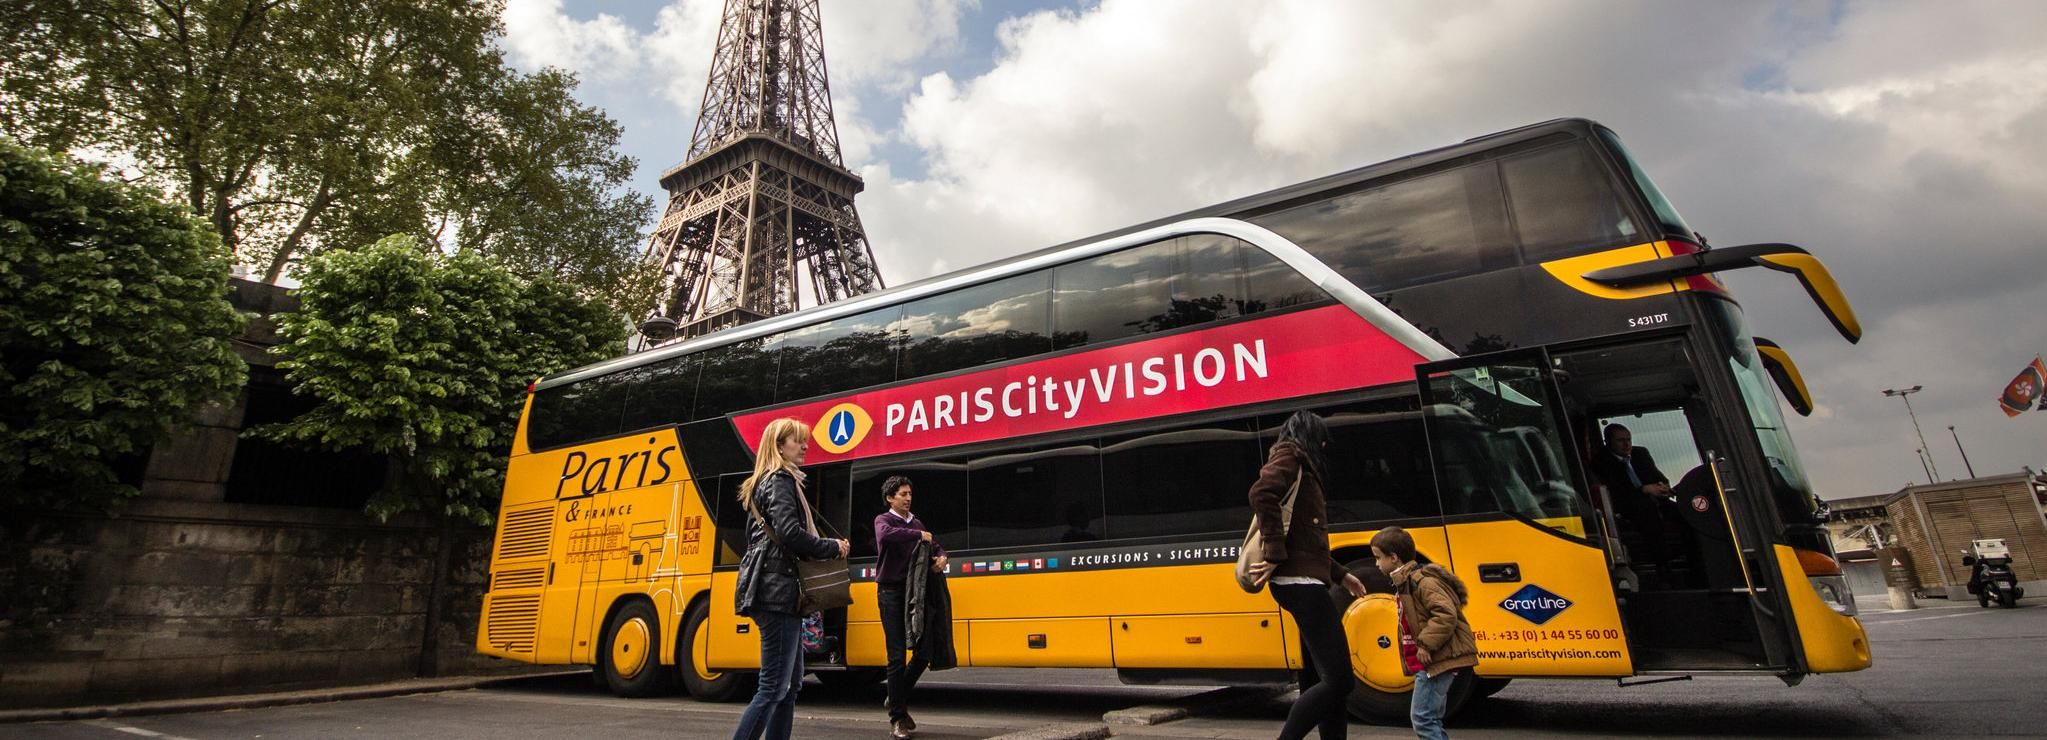 Paris: Audio-Guided Bus Tour & Cruise, Eiffel Tower & Lunch